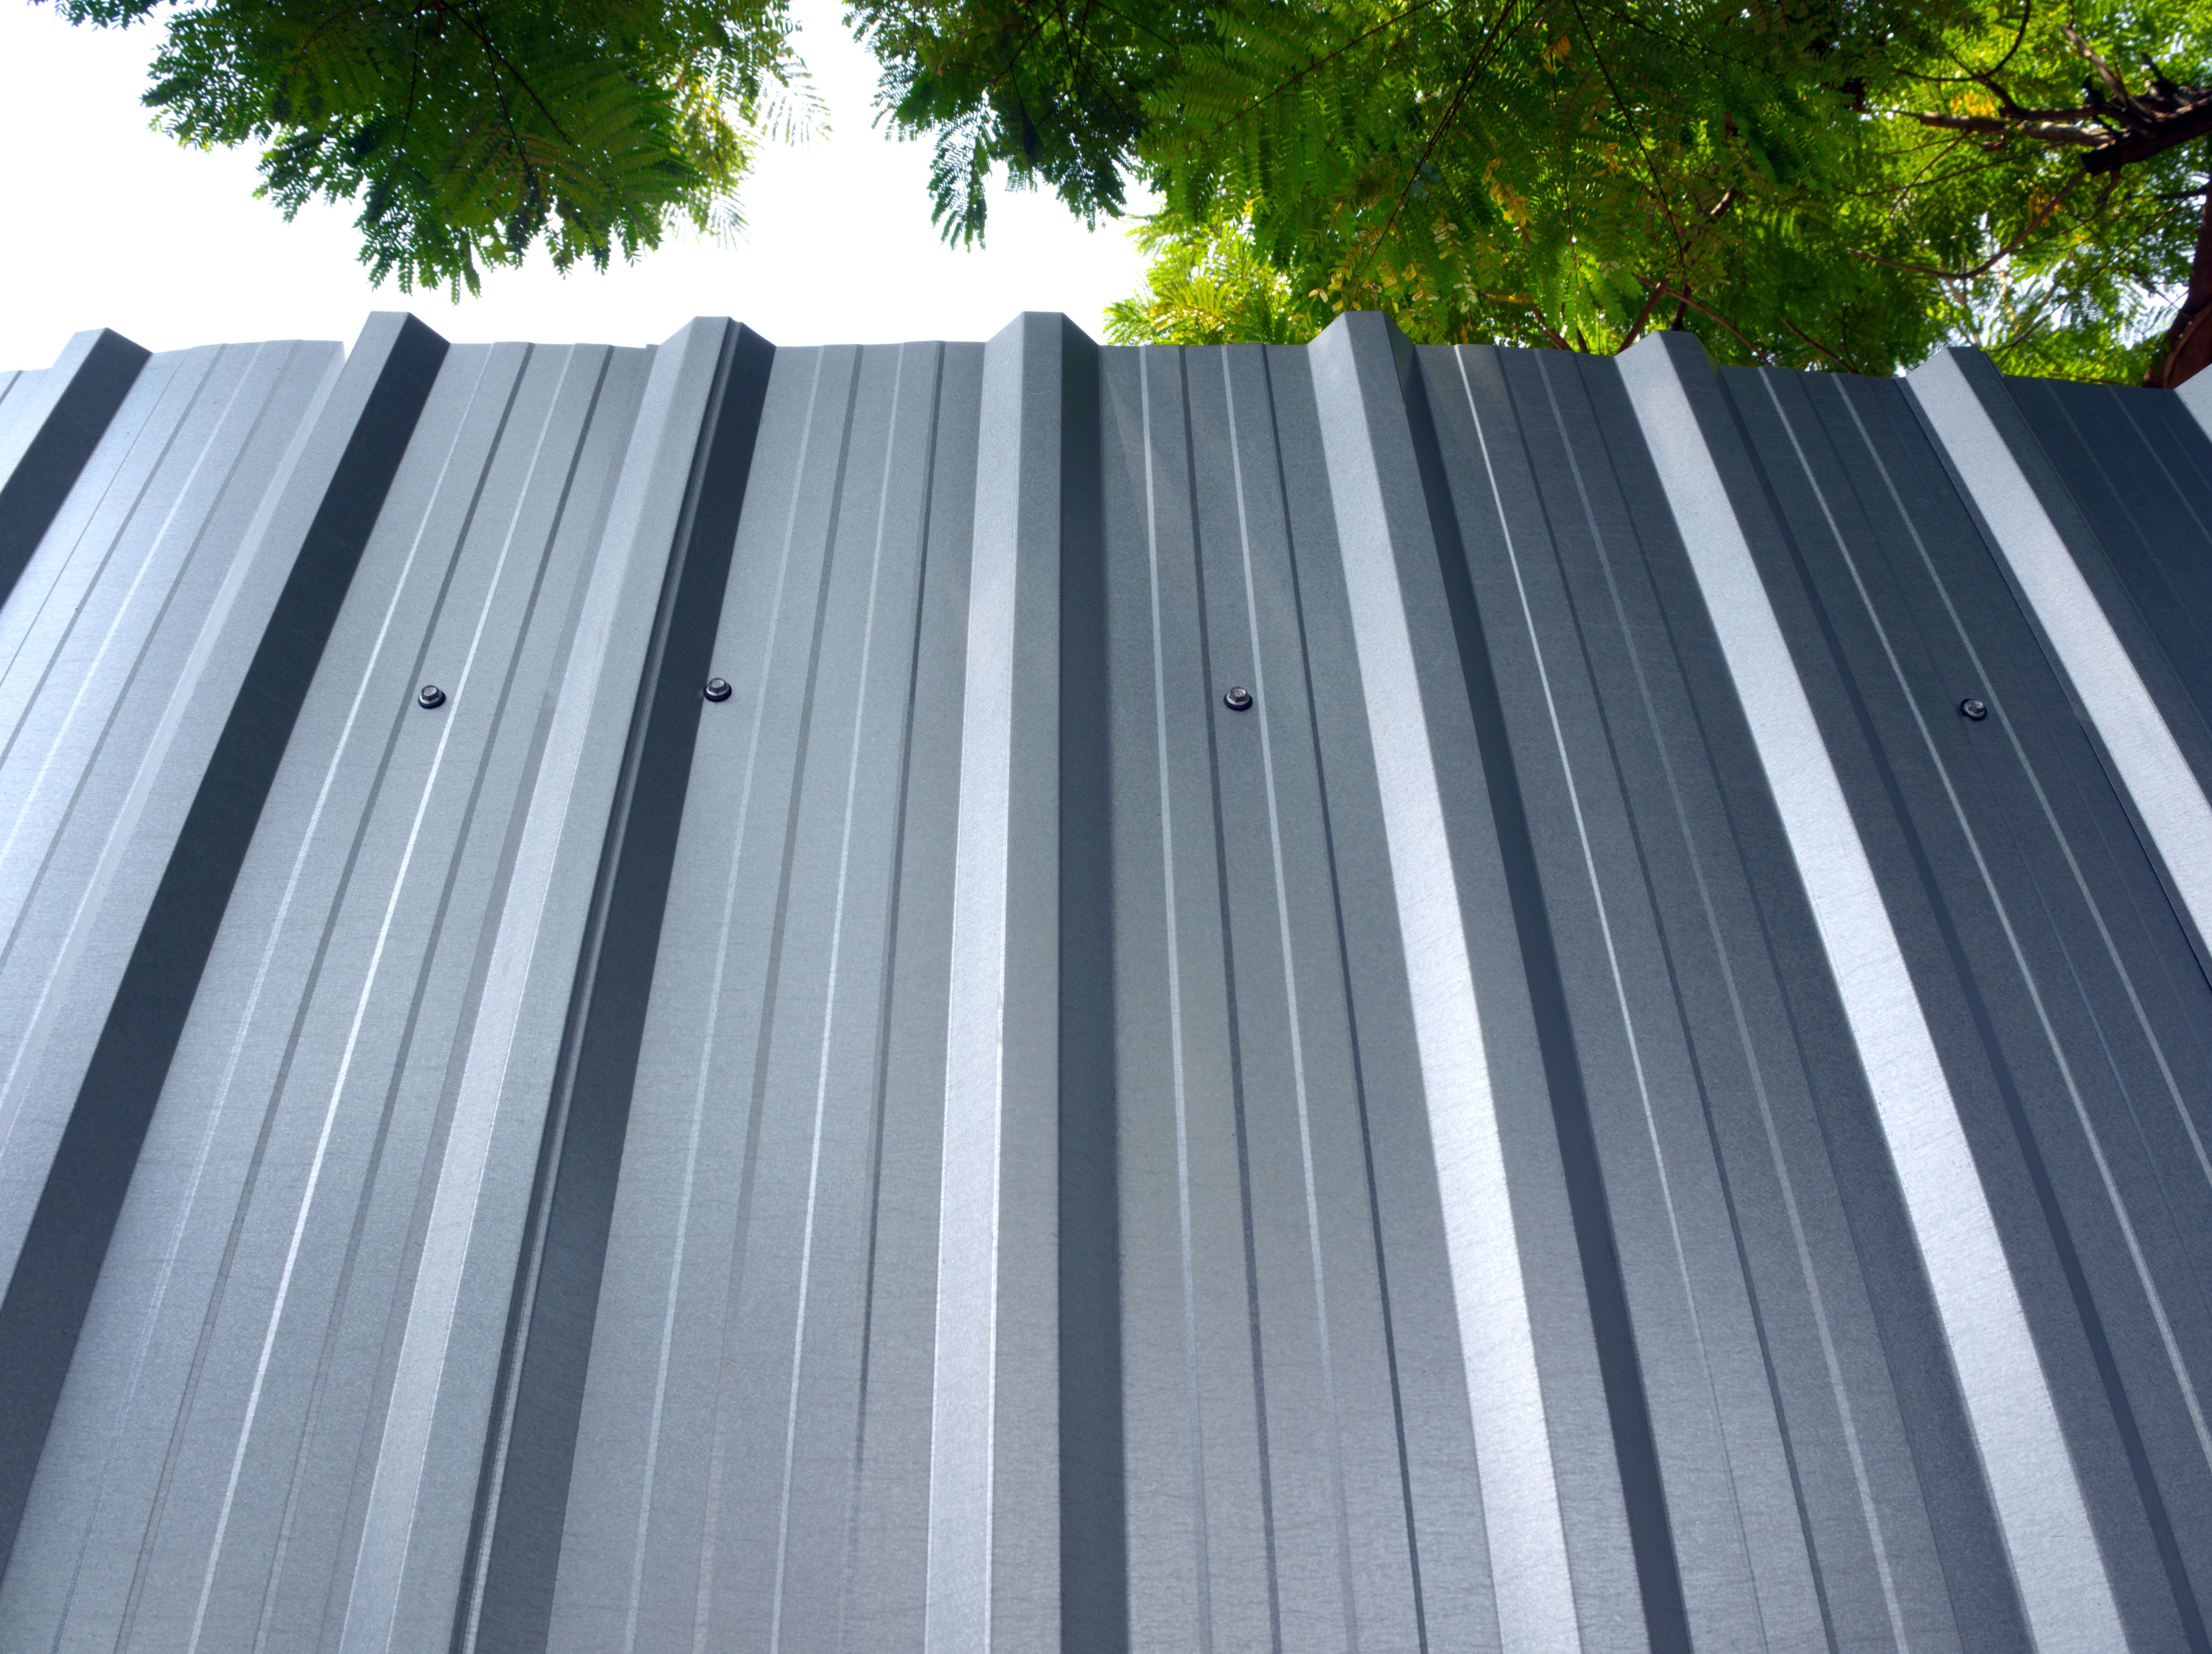 Diy Corrugated Metal Siding Hunker Corrugated Metal Siding Metal Siding Corrugated Metal Roof